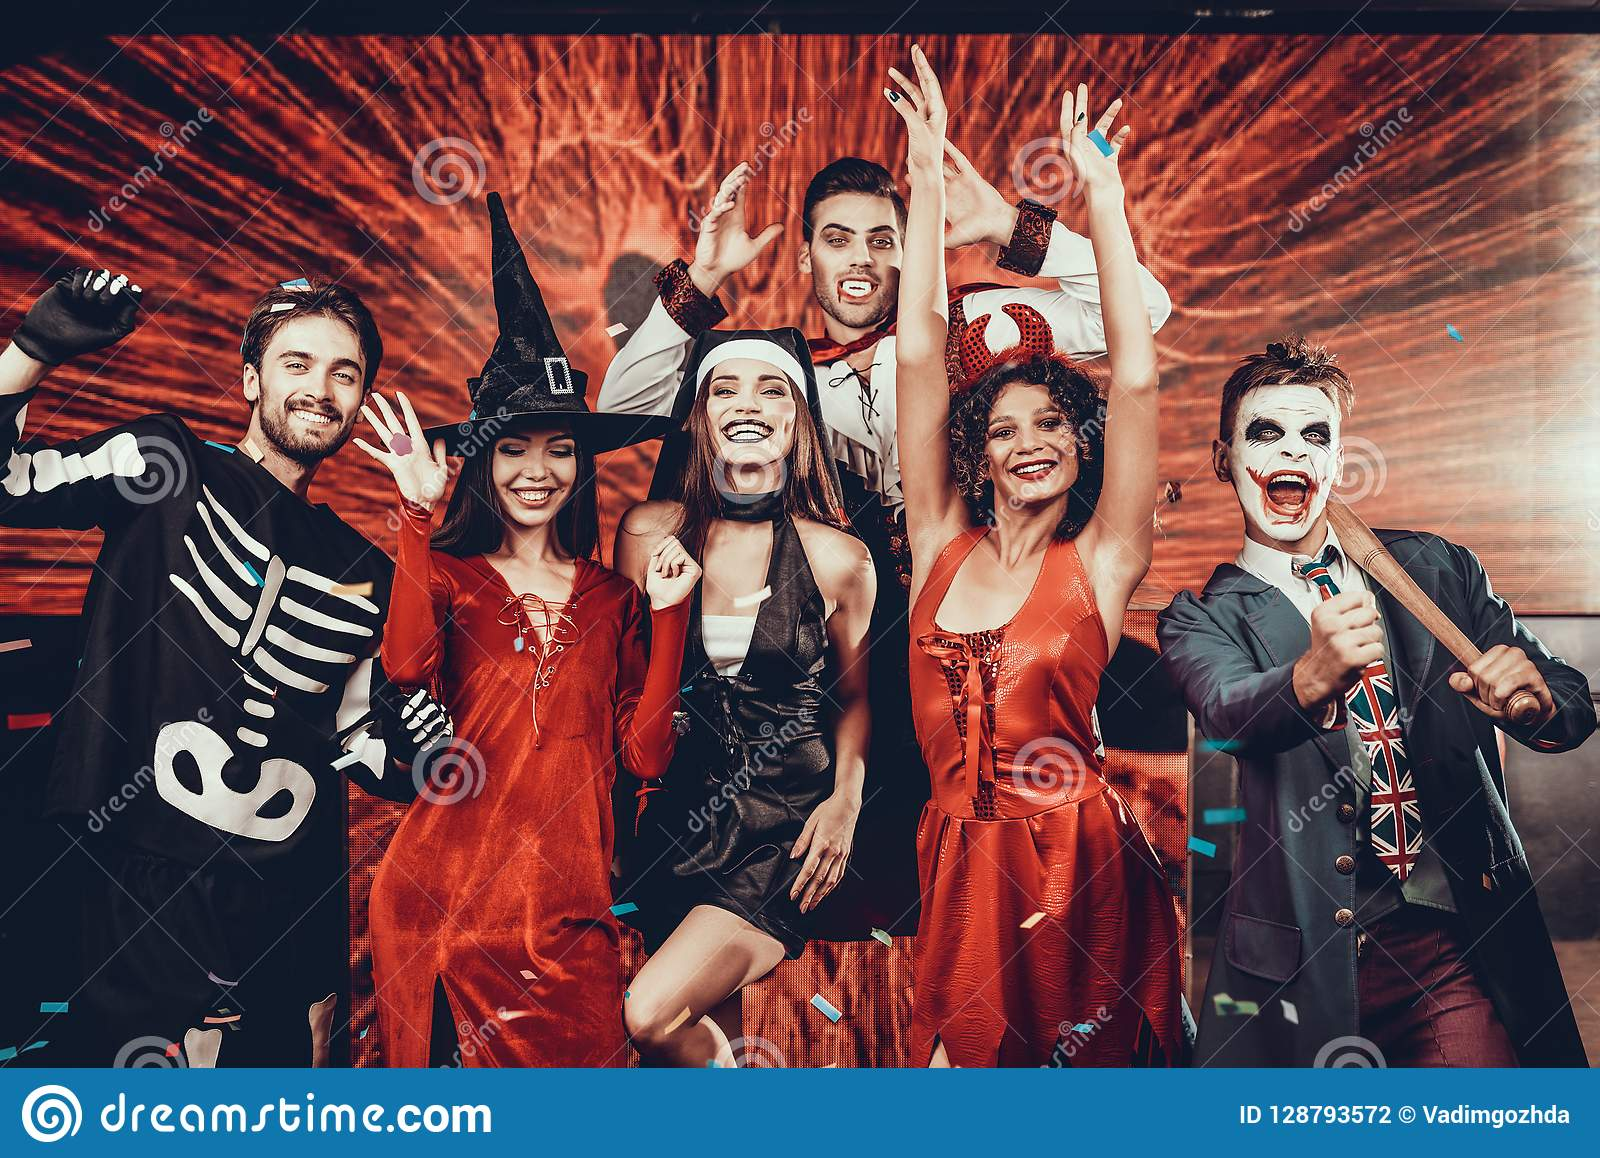 Enge Halloween Kostuums.Portret Van Jonge Glimlachende Mensen In Enge Kostuums Stock